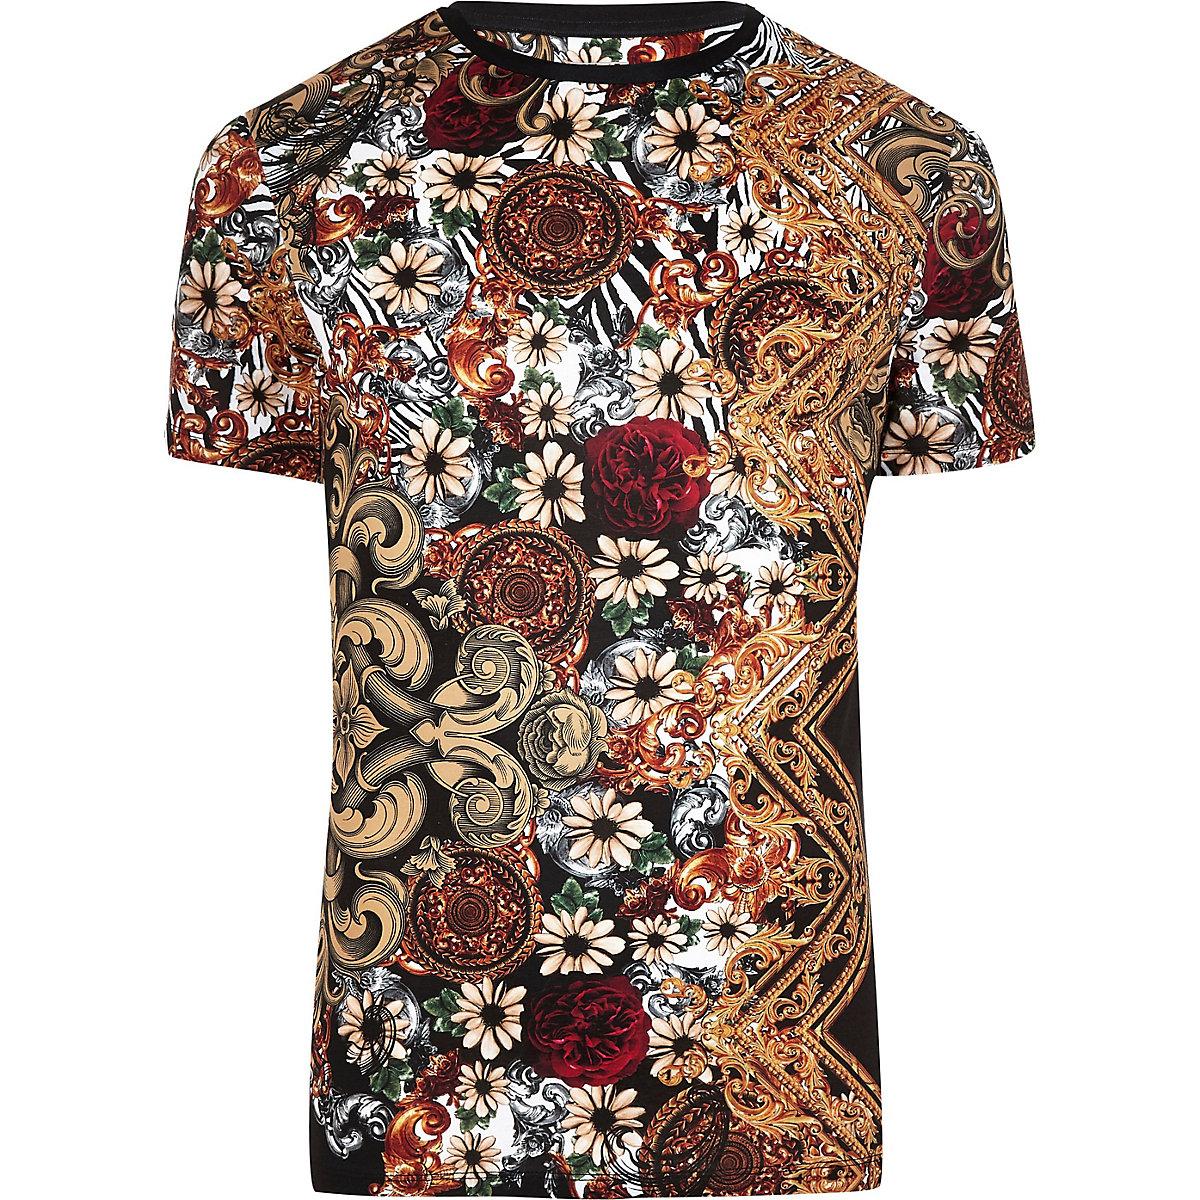 Big and Tall slim fit black baroque T-shirt